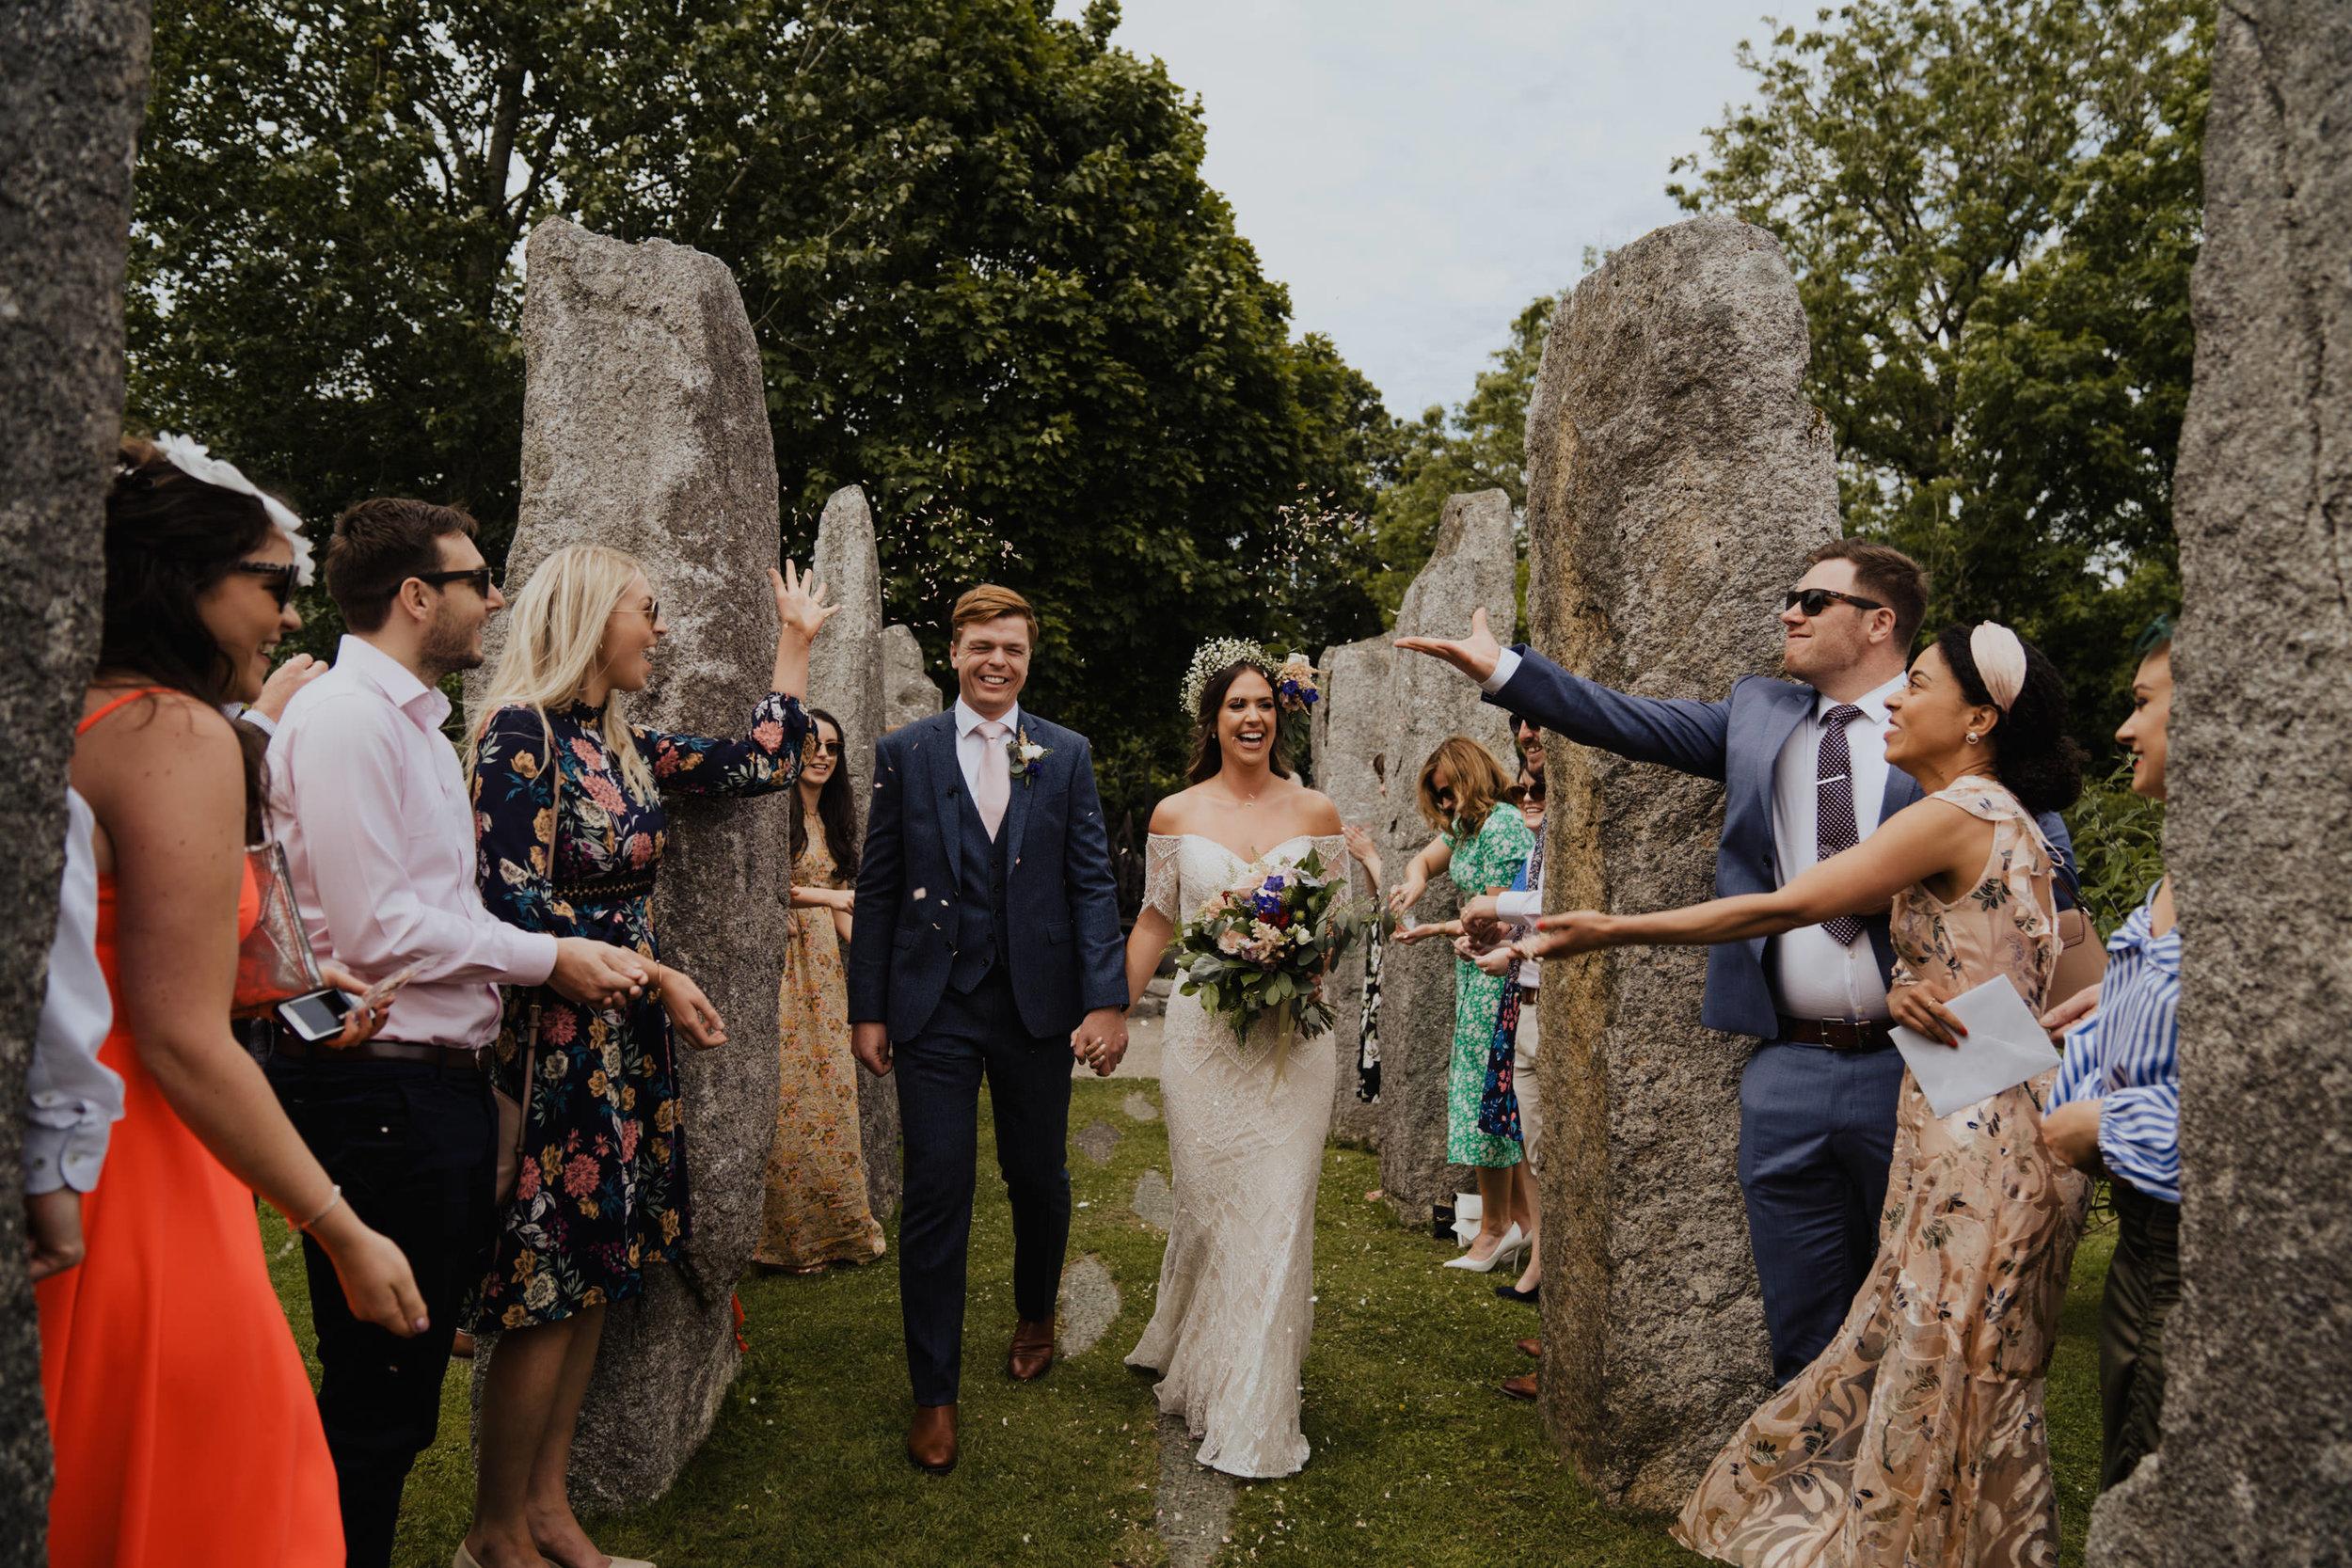 c&j_brigits_garden_galway_wedding_photographer_livia_figueiredo_25.jpg